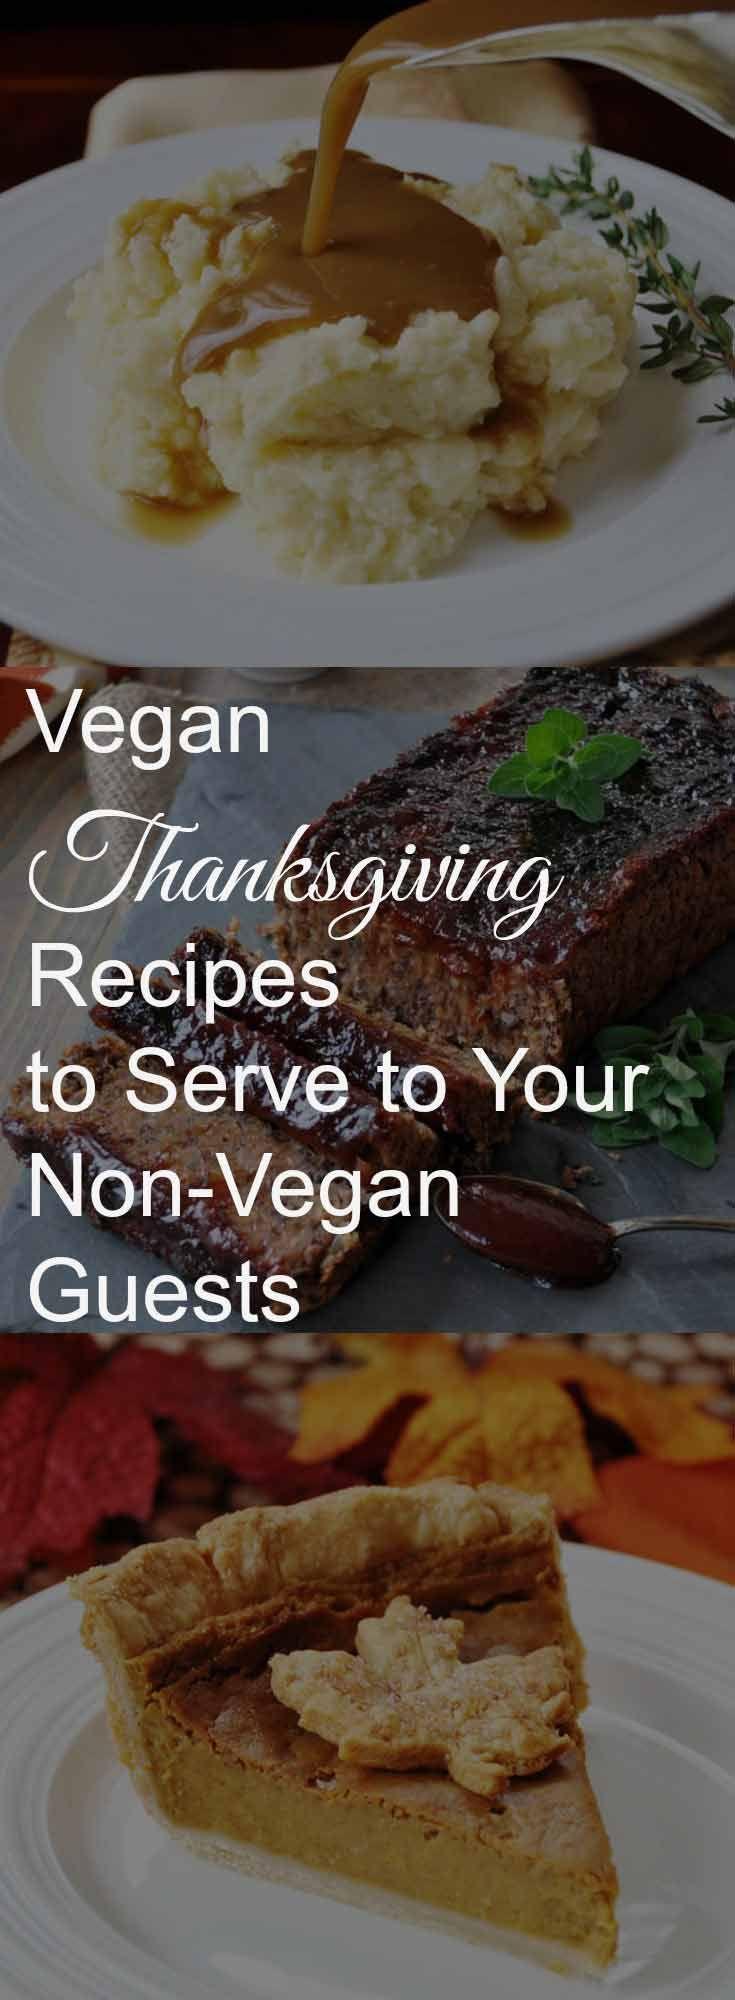 Vegan Thanksgiving Gravy  1000 images about Vegan Thanksgiving Recipes on Pinterest